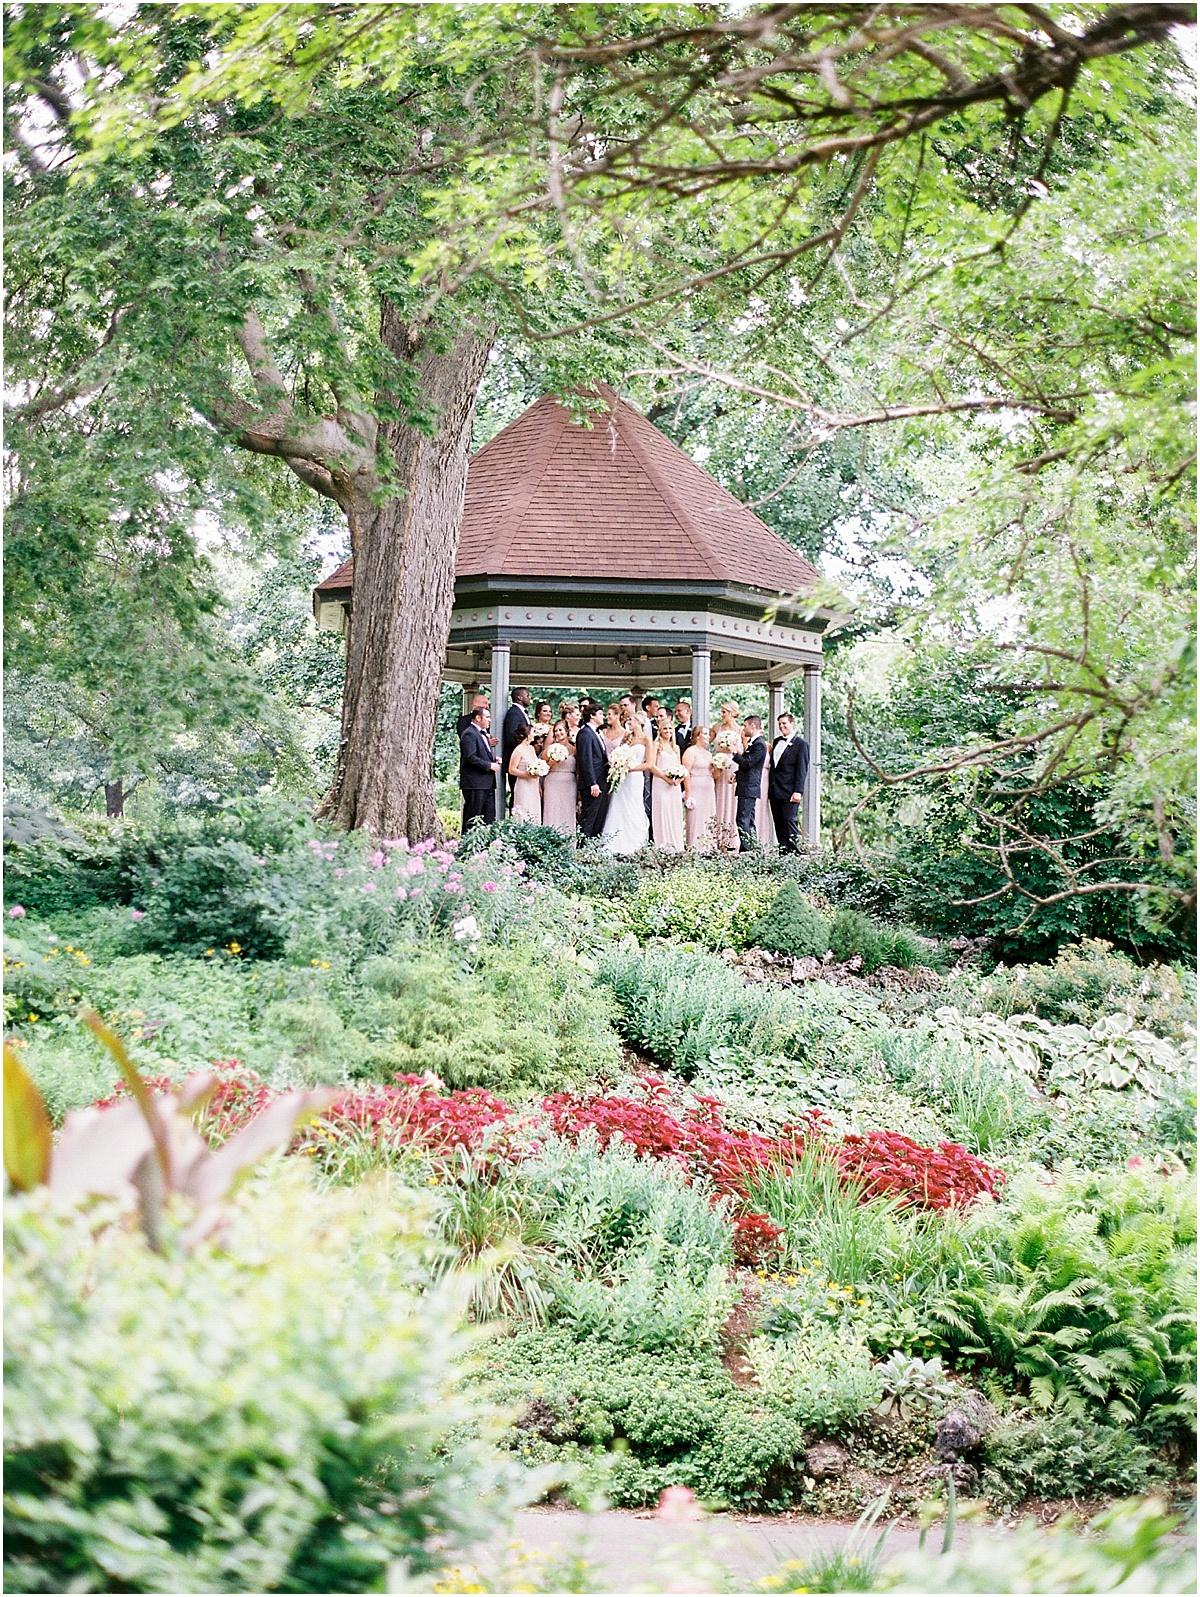 St_Louis_Wedding_Fine_Art_Film_Photographer_Jordan_Brittley_(www.jordanbrittley.com)_0016.jpg